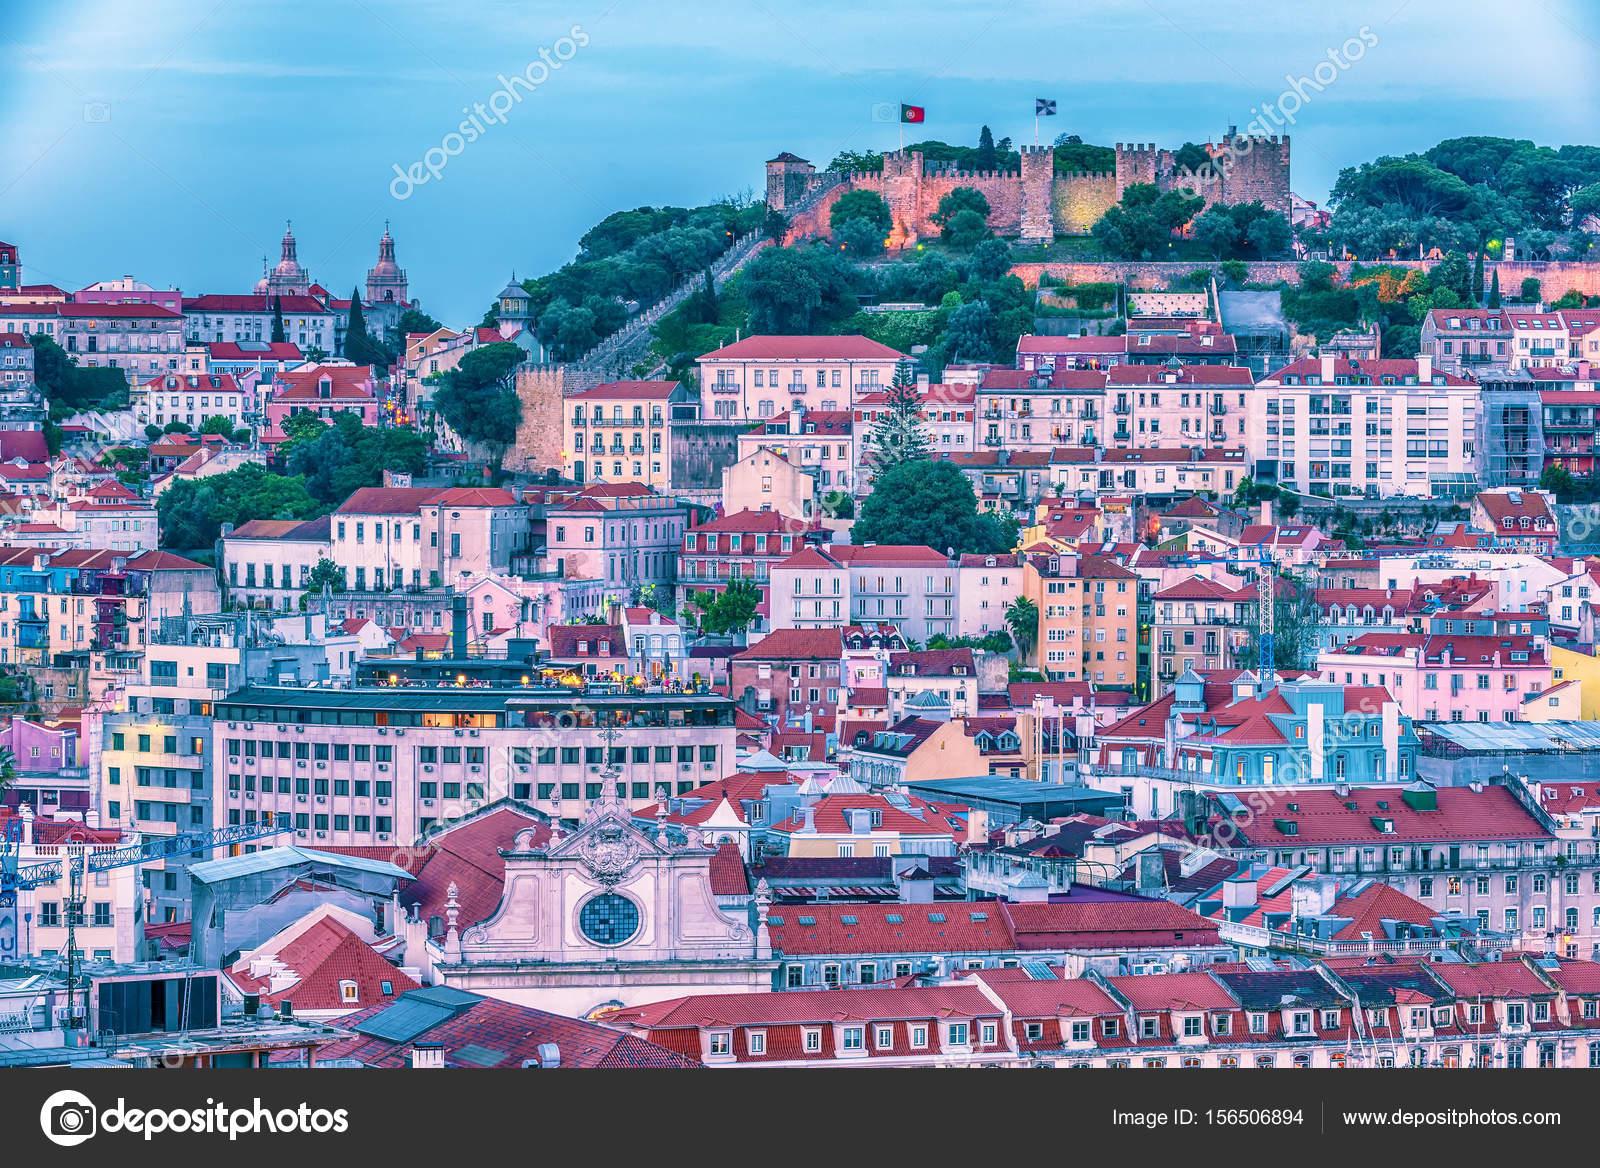 Lisboa portugal antena ver el casco antiguo y sao jorge - Casco antiguo de lisboa ...